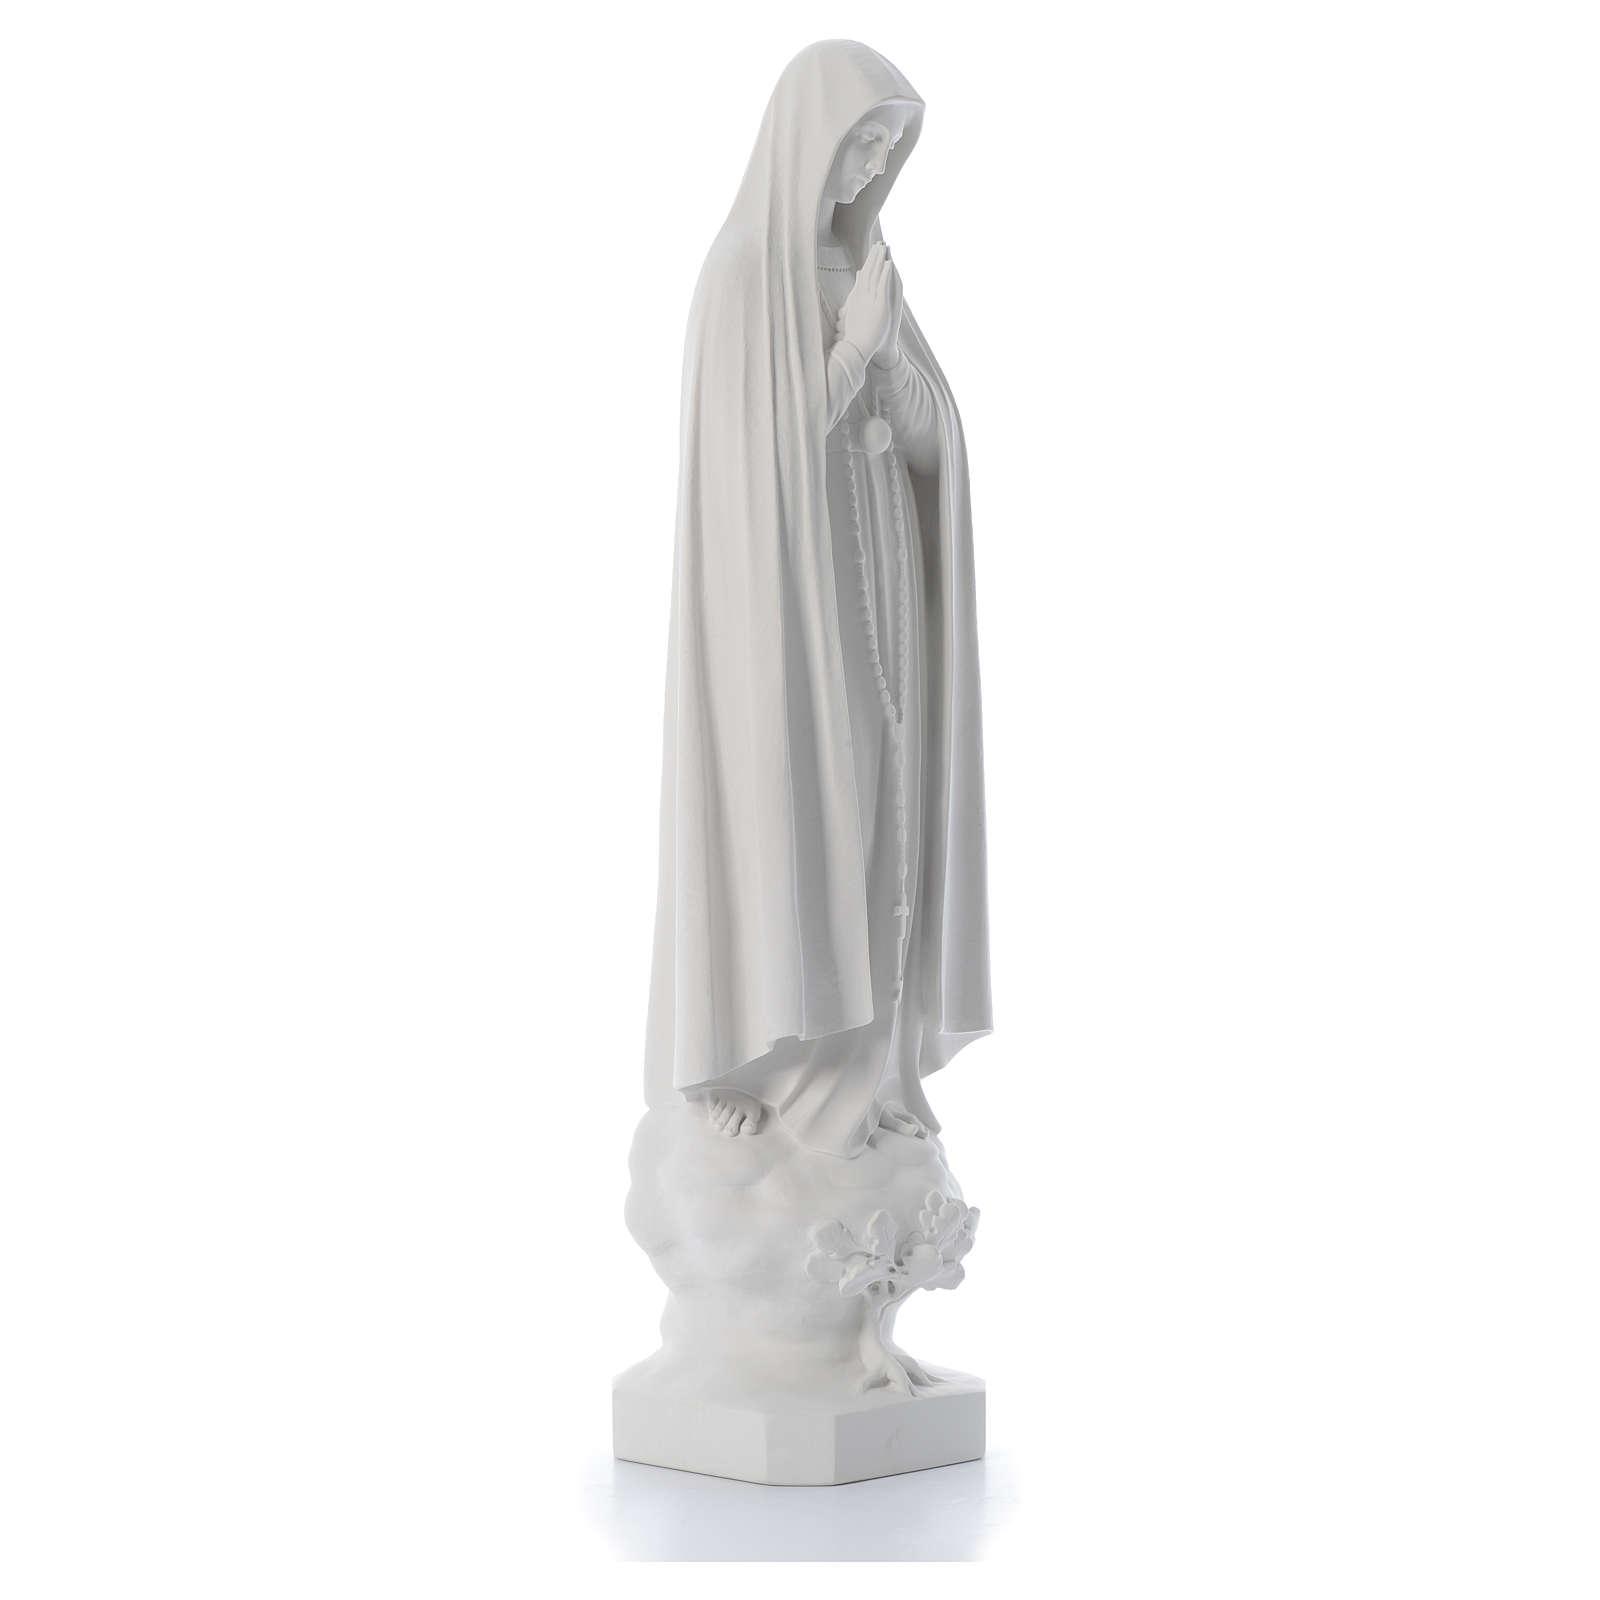 Mármol sintético,Virgen de Fátima 100cm 4